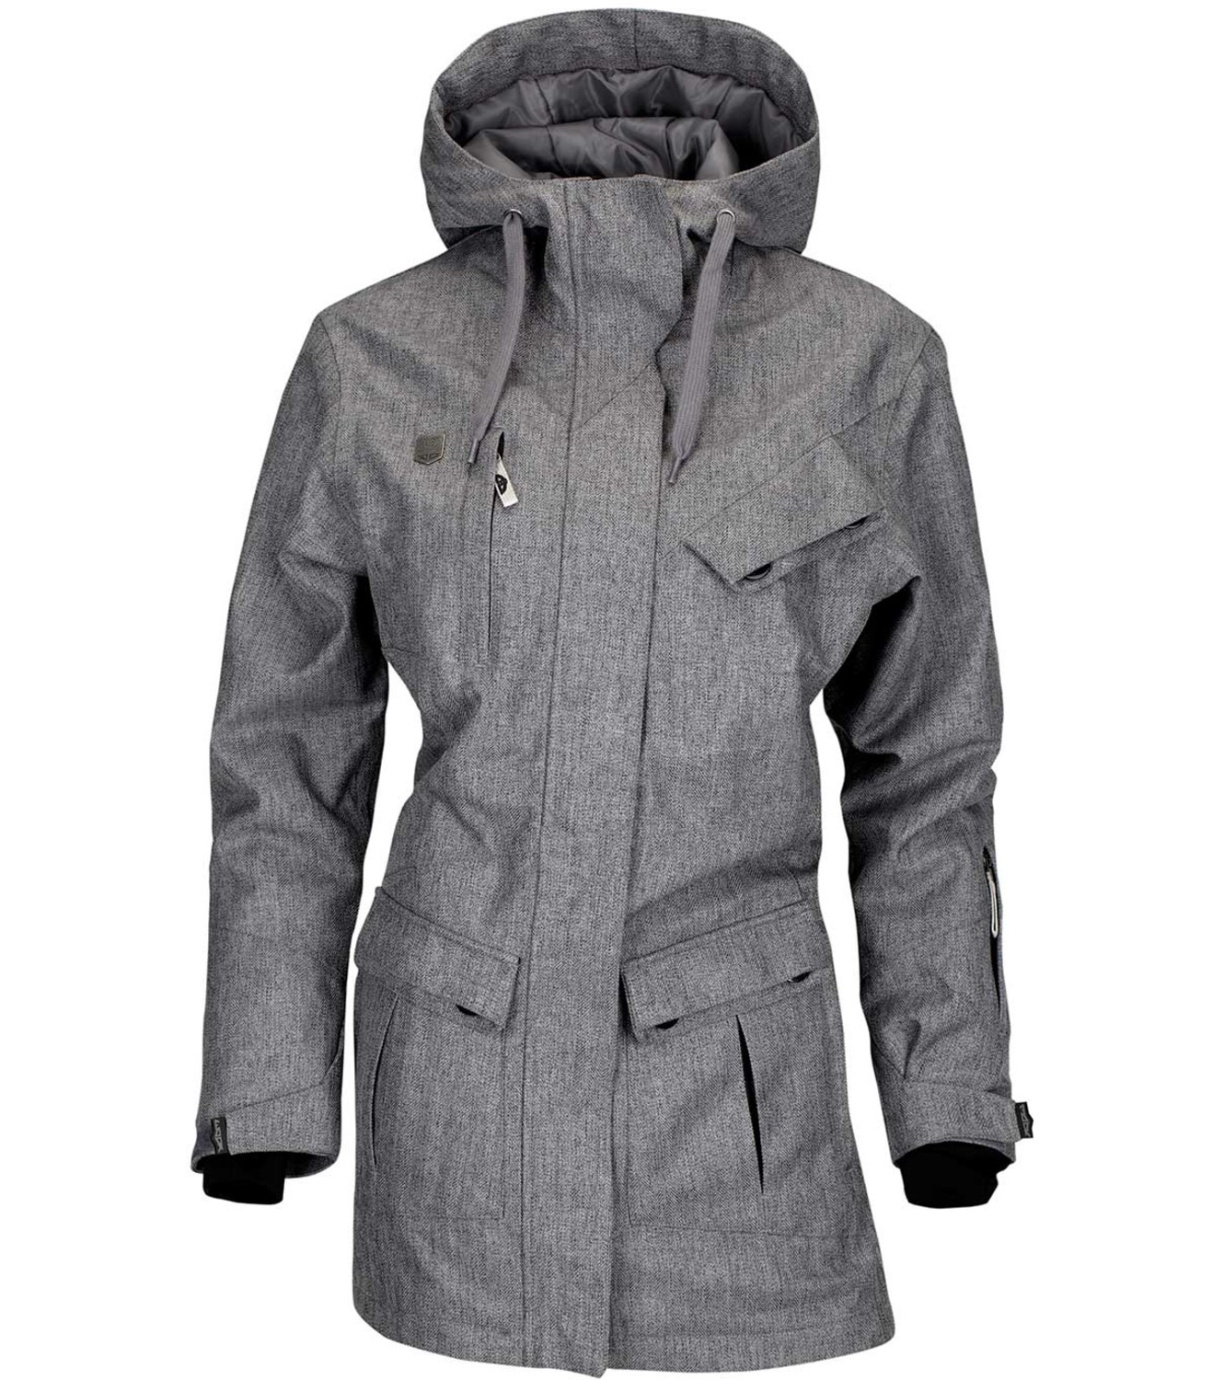 WOOX Cristy Ladies´ Jacket Grey wx1420304 46